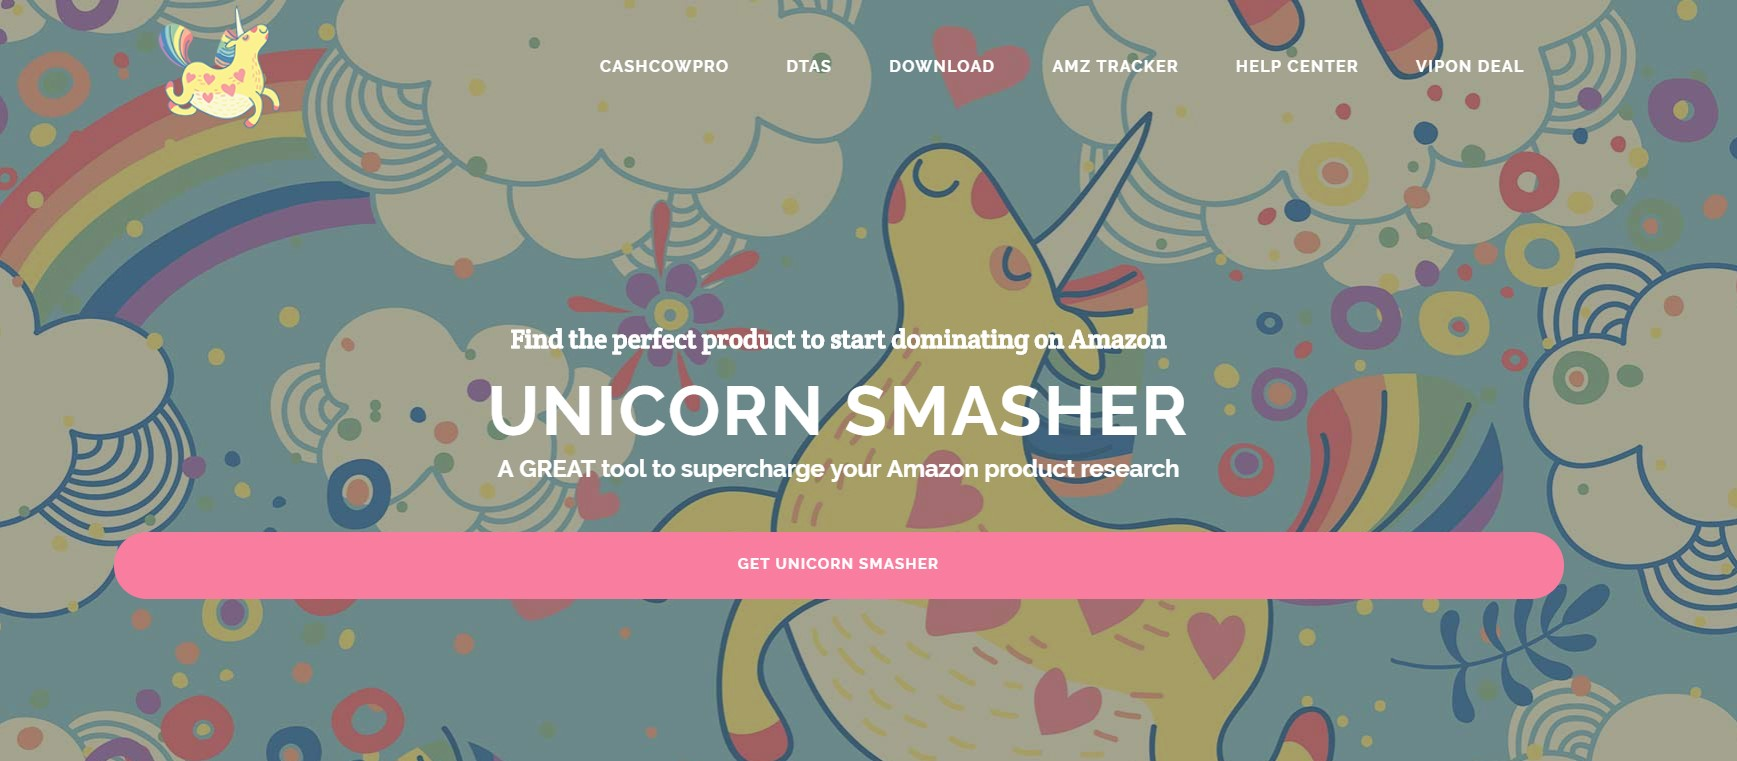 unicorn-smasher.jpg